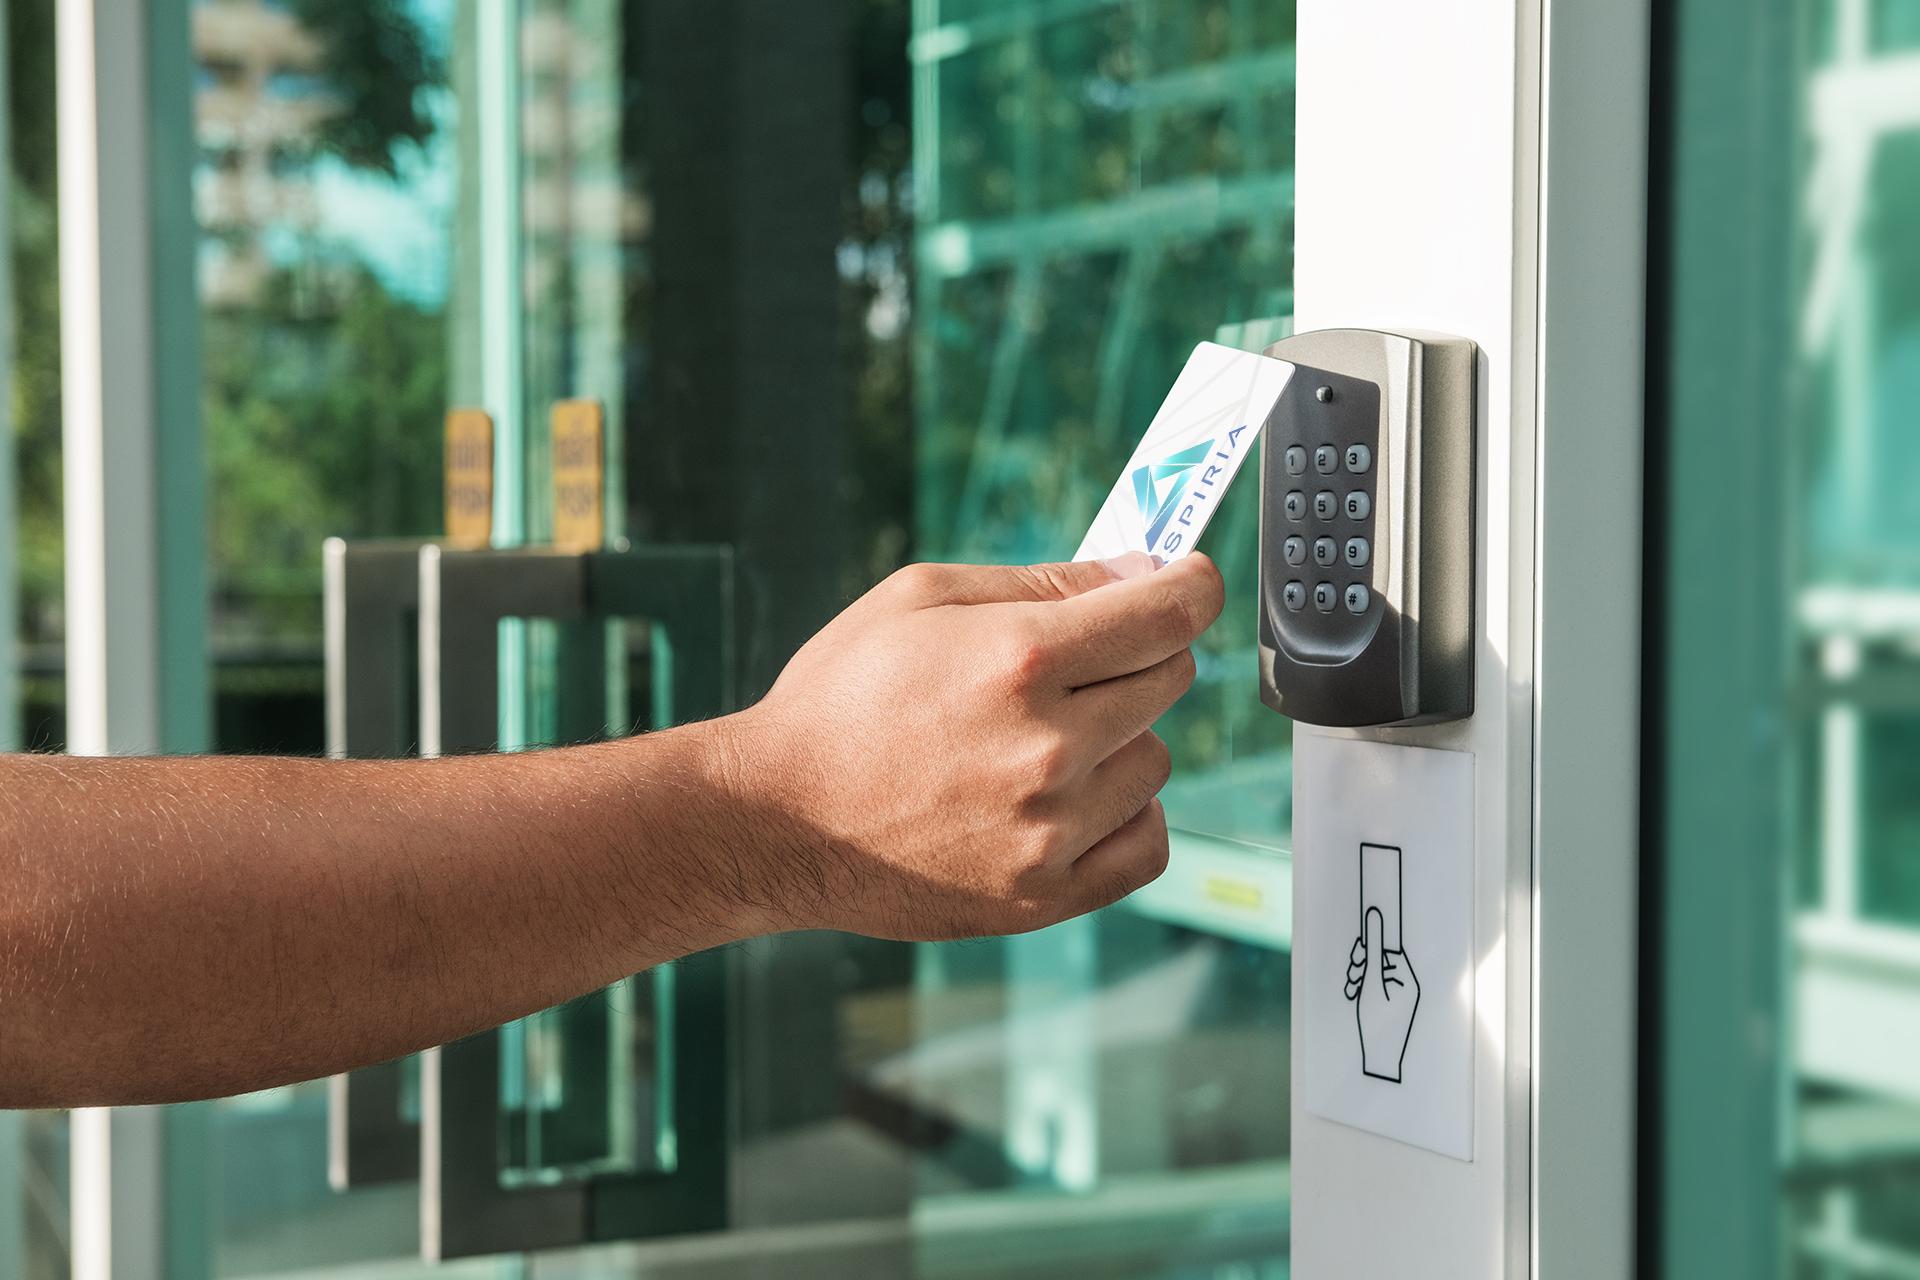 A man swipes his access card to enter an Aspiria building.